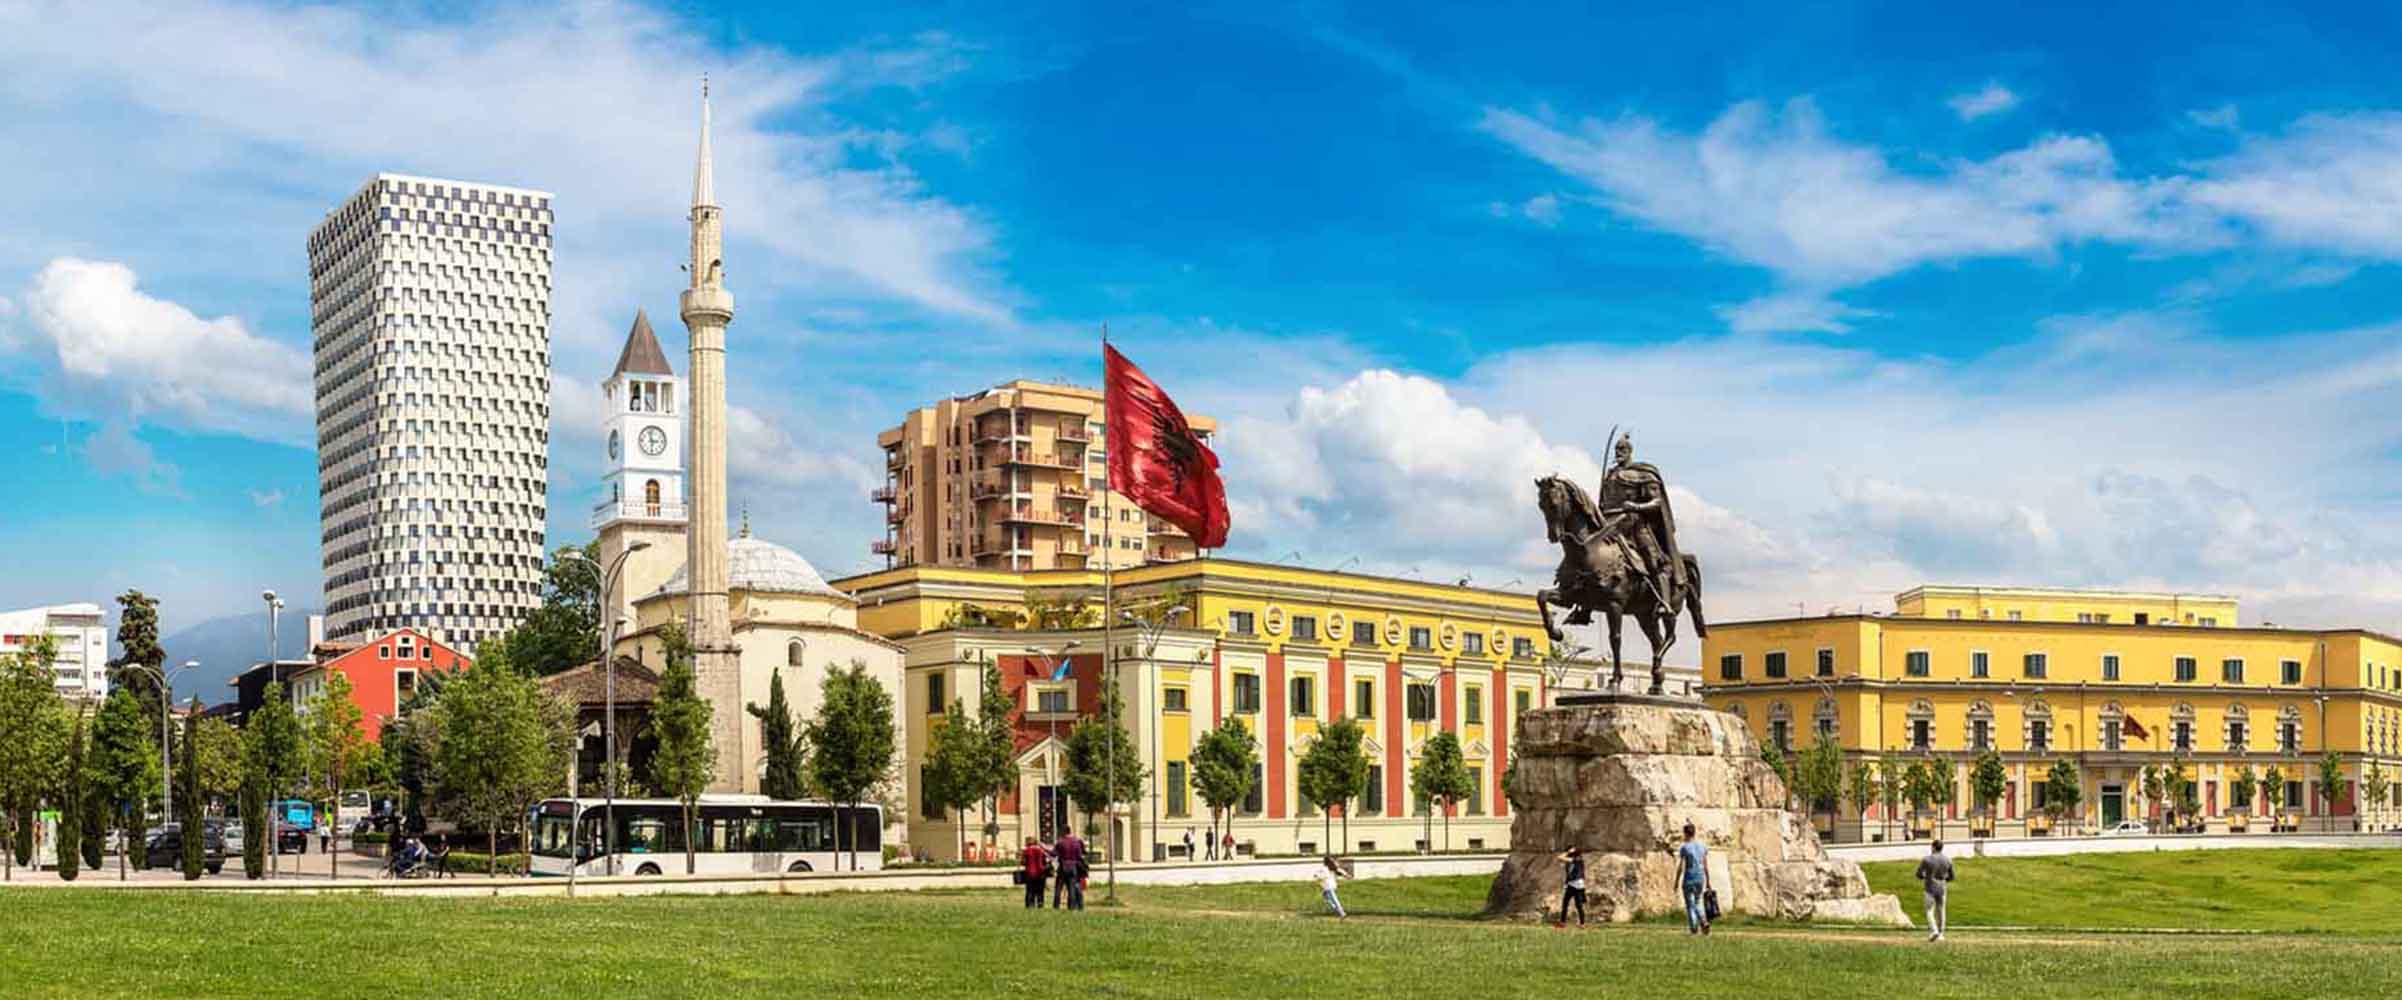 maquette 2 header – albanie